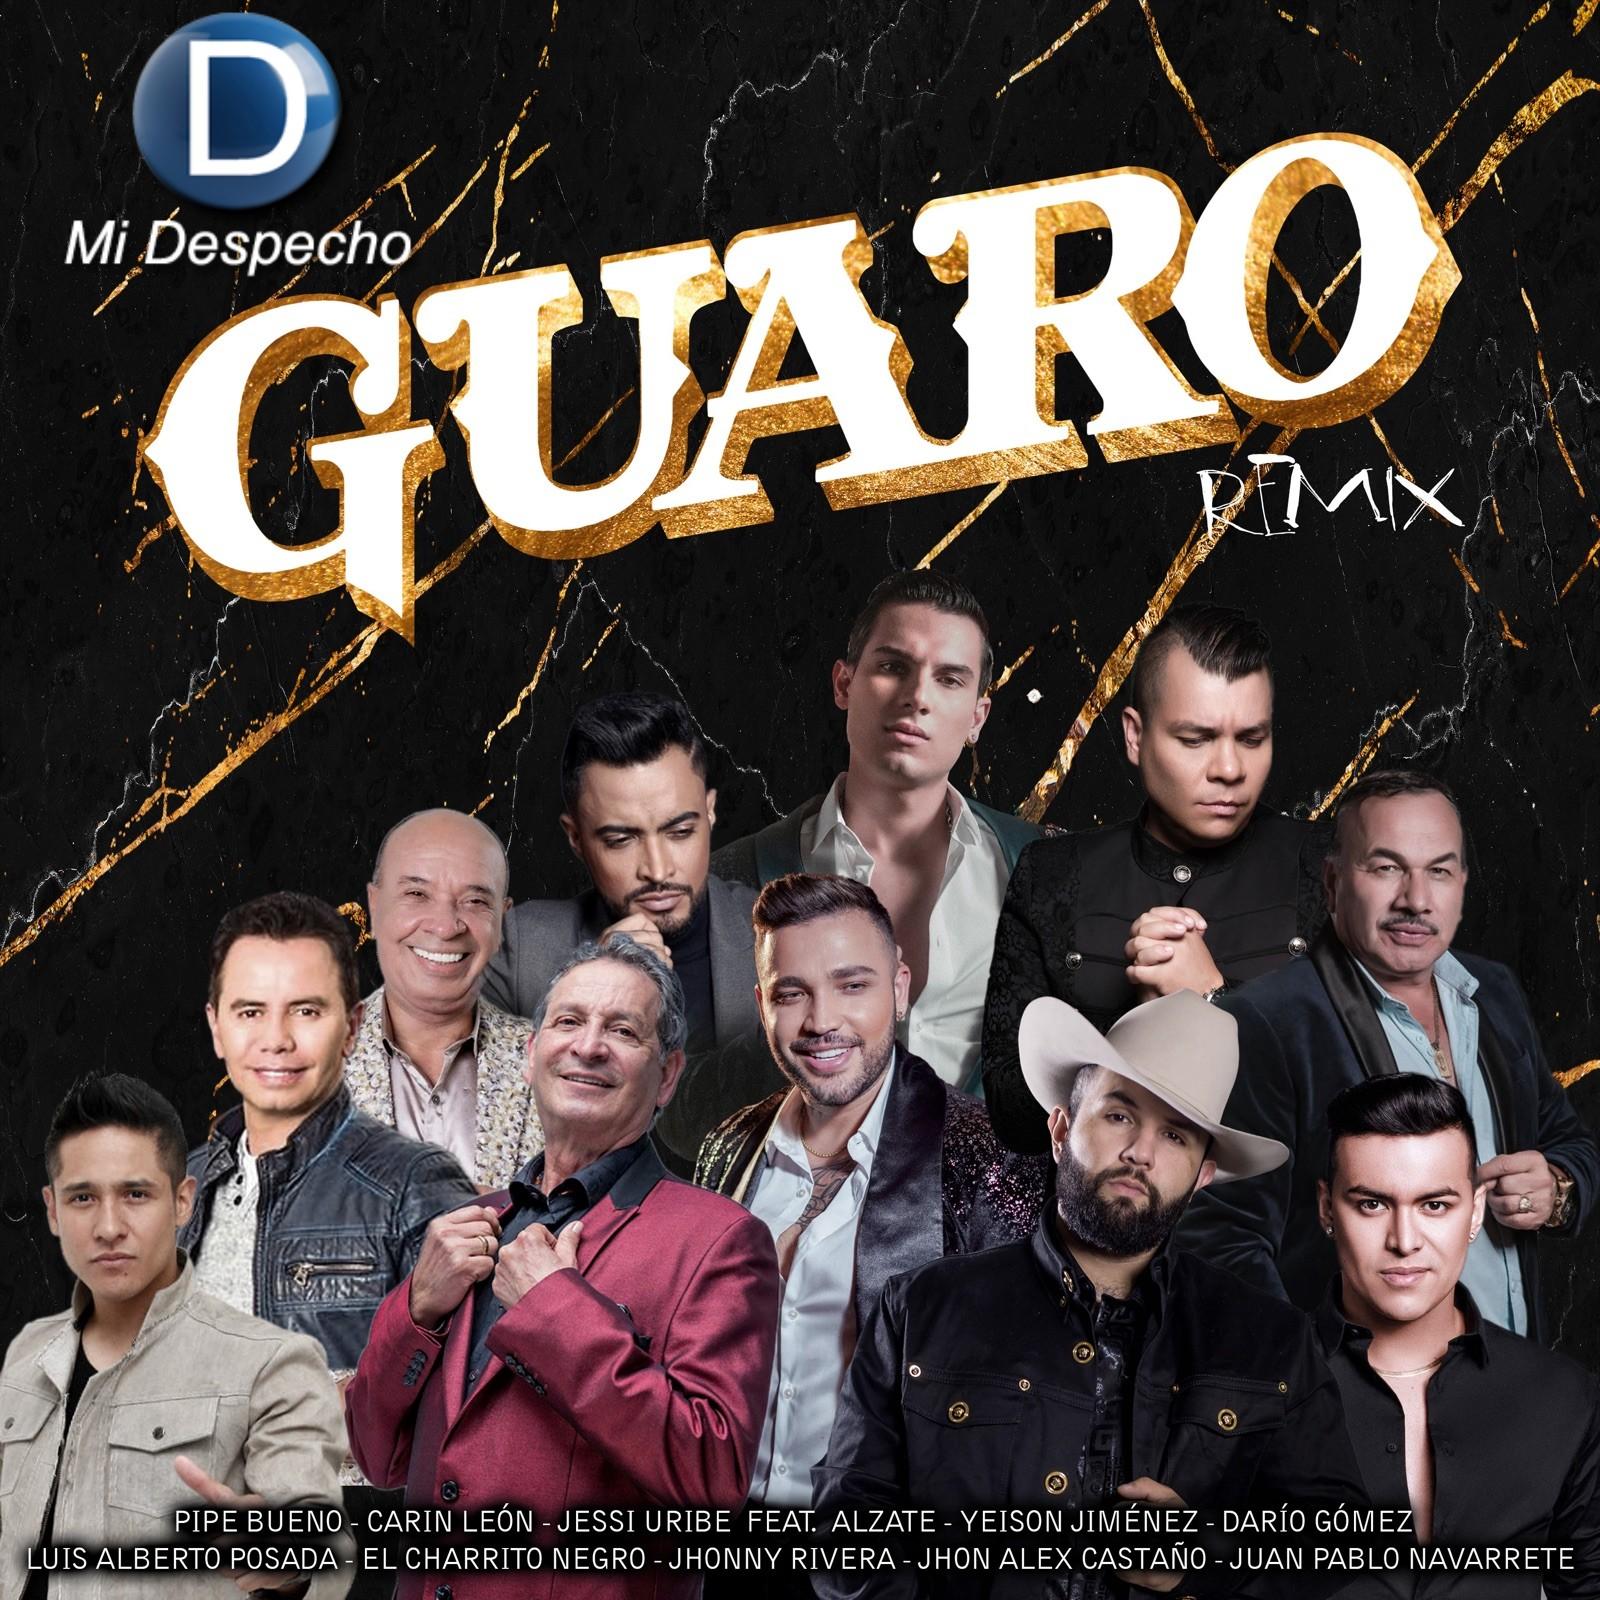 Pipe Bueno Guaro Remix Frontal